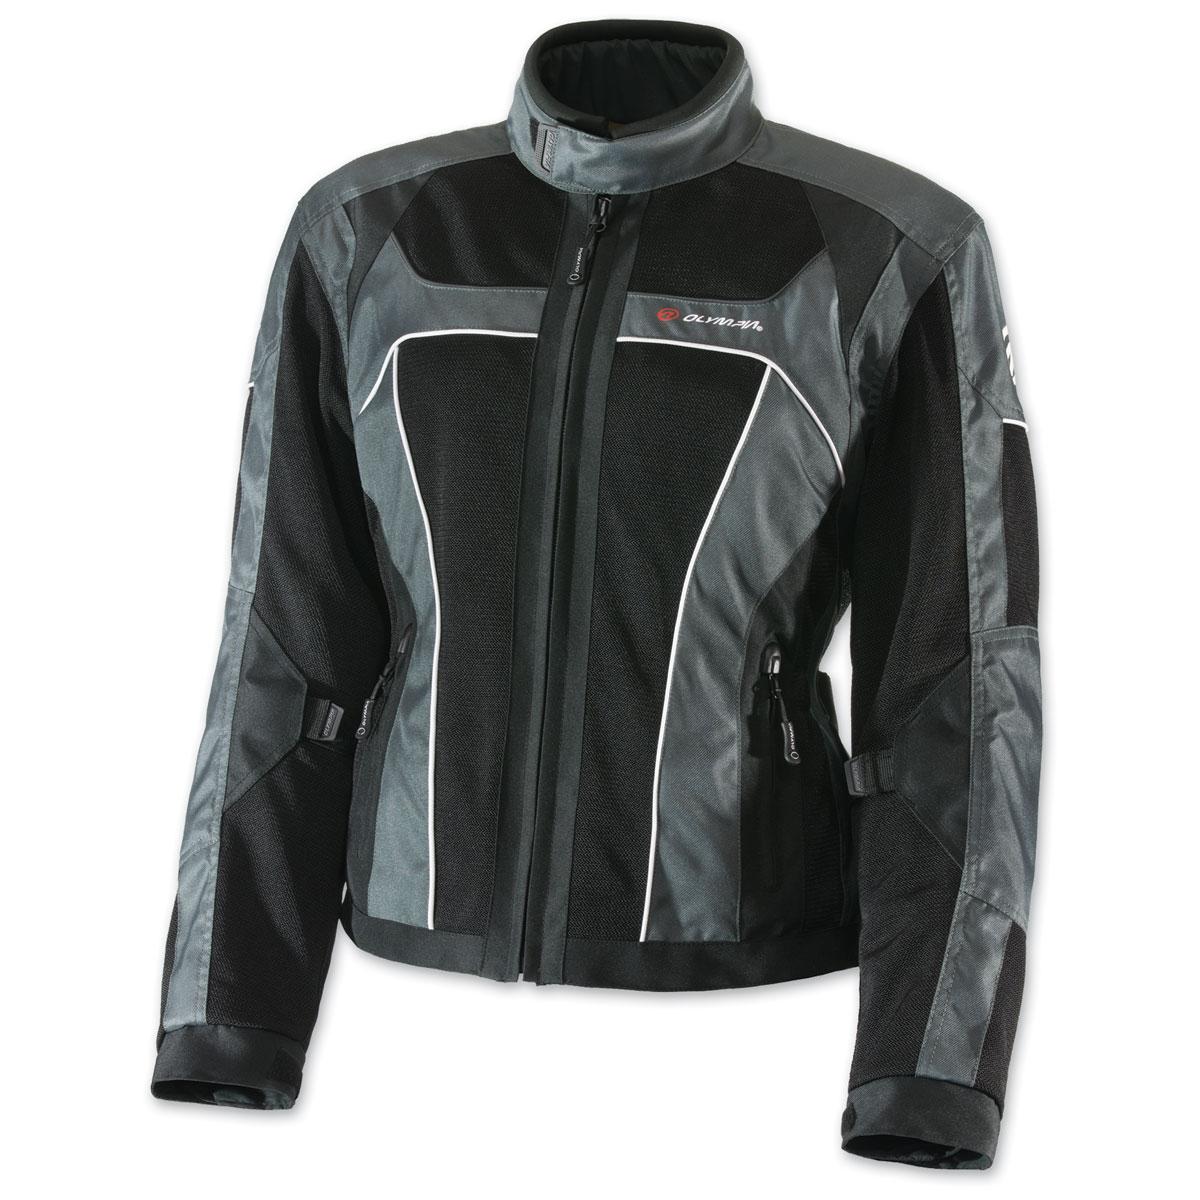 Olympia Moto Sports Women's Eve Mesh Tech Gray Jacket